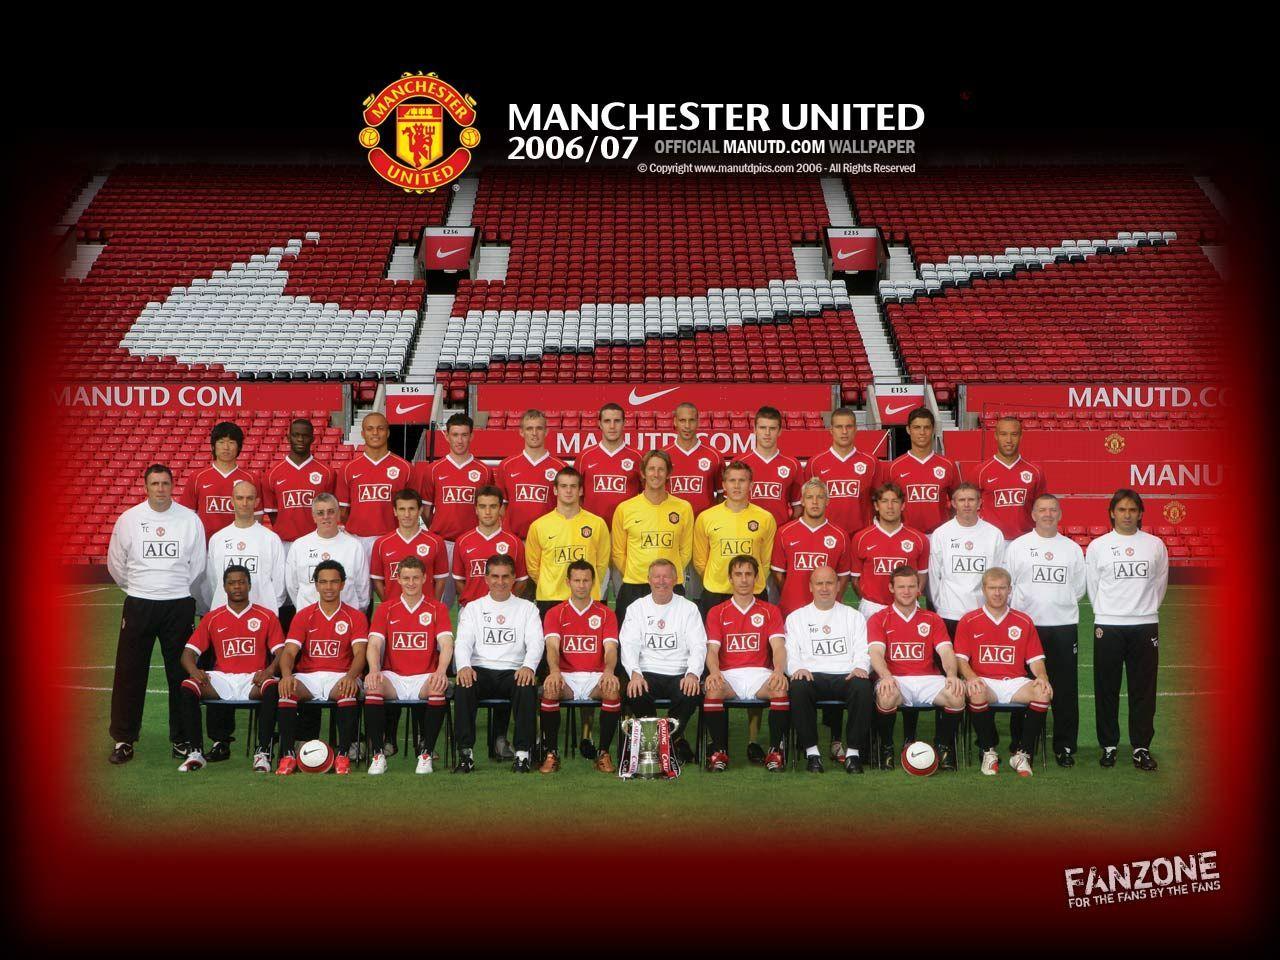 Manchester United Manchester United Team Manchester United Manchester United Wallpaper